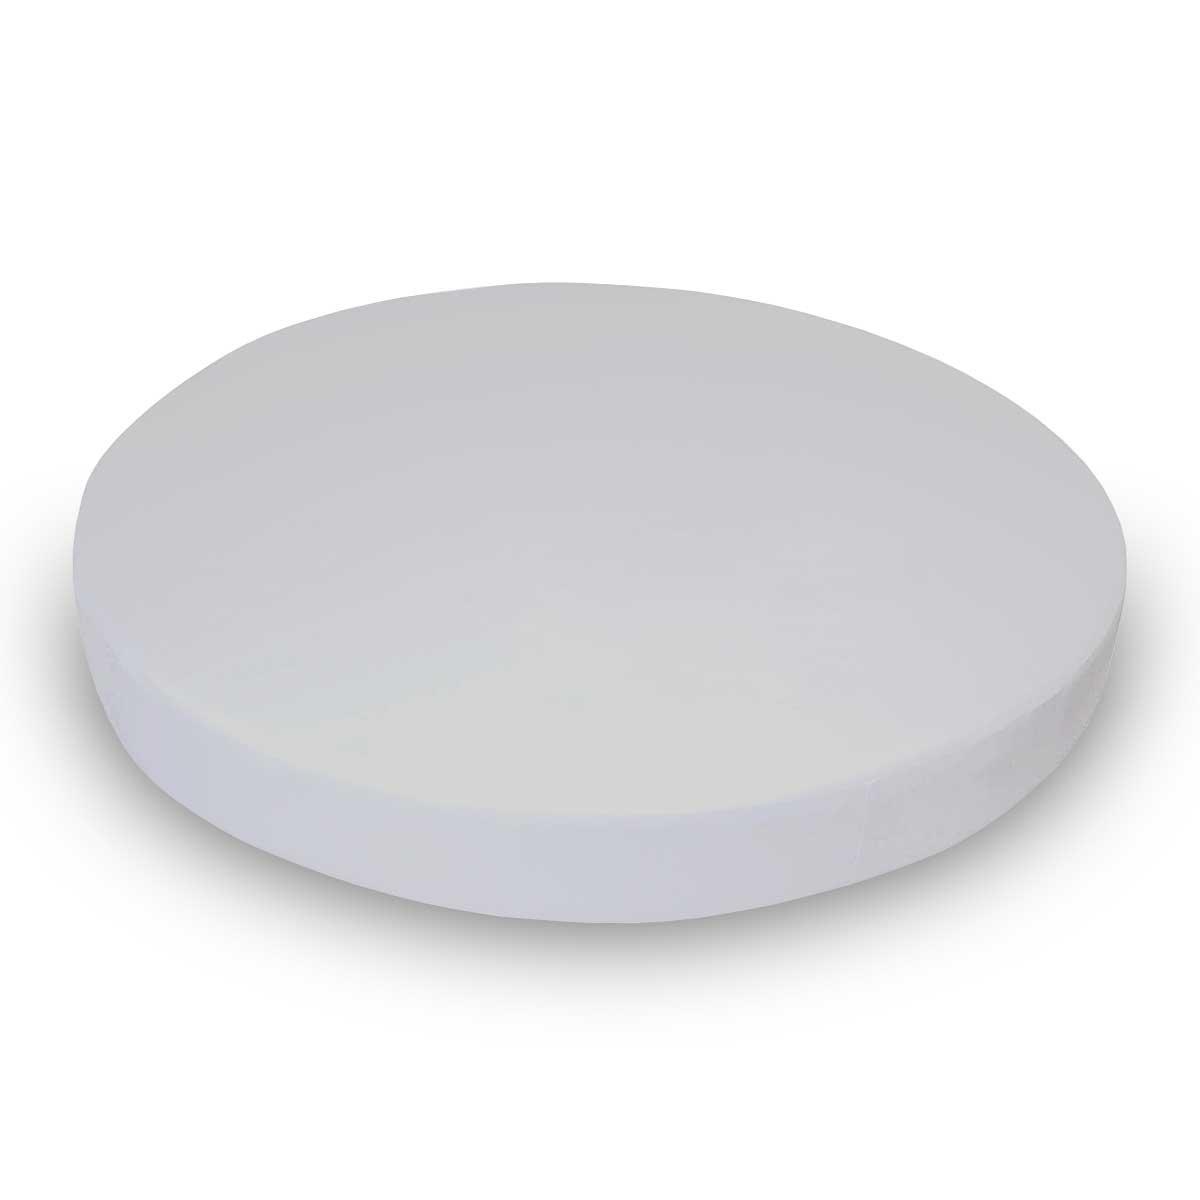 SheetWorld 100% Cotton Jersey Round Crib Sheet, Silver Grey, 42 x 42, Made In USA